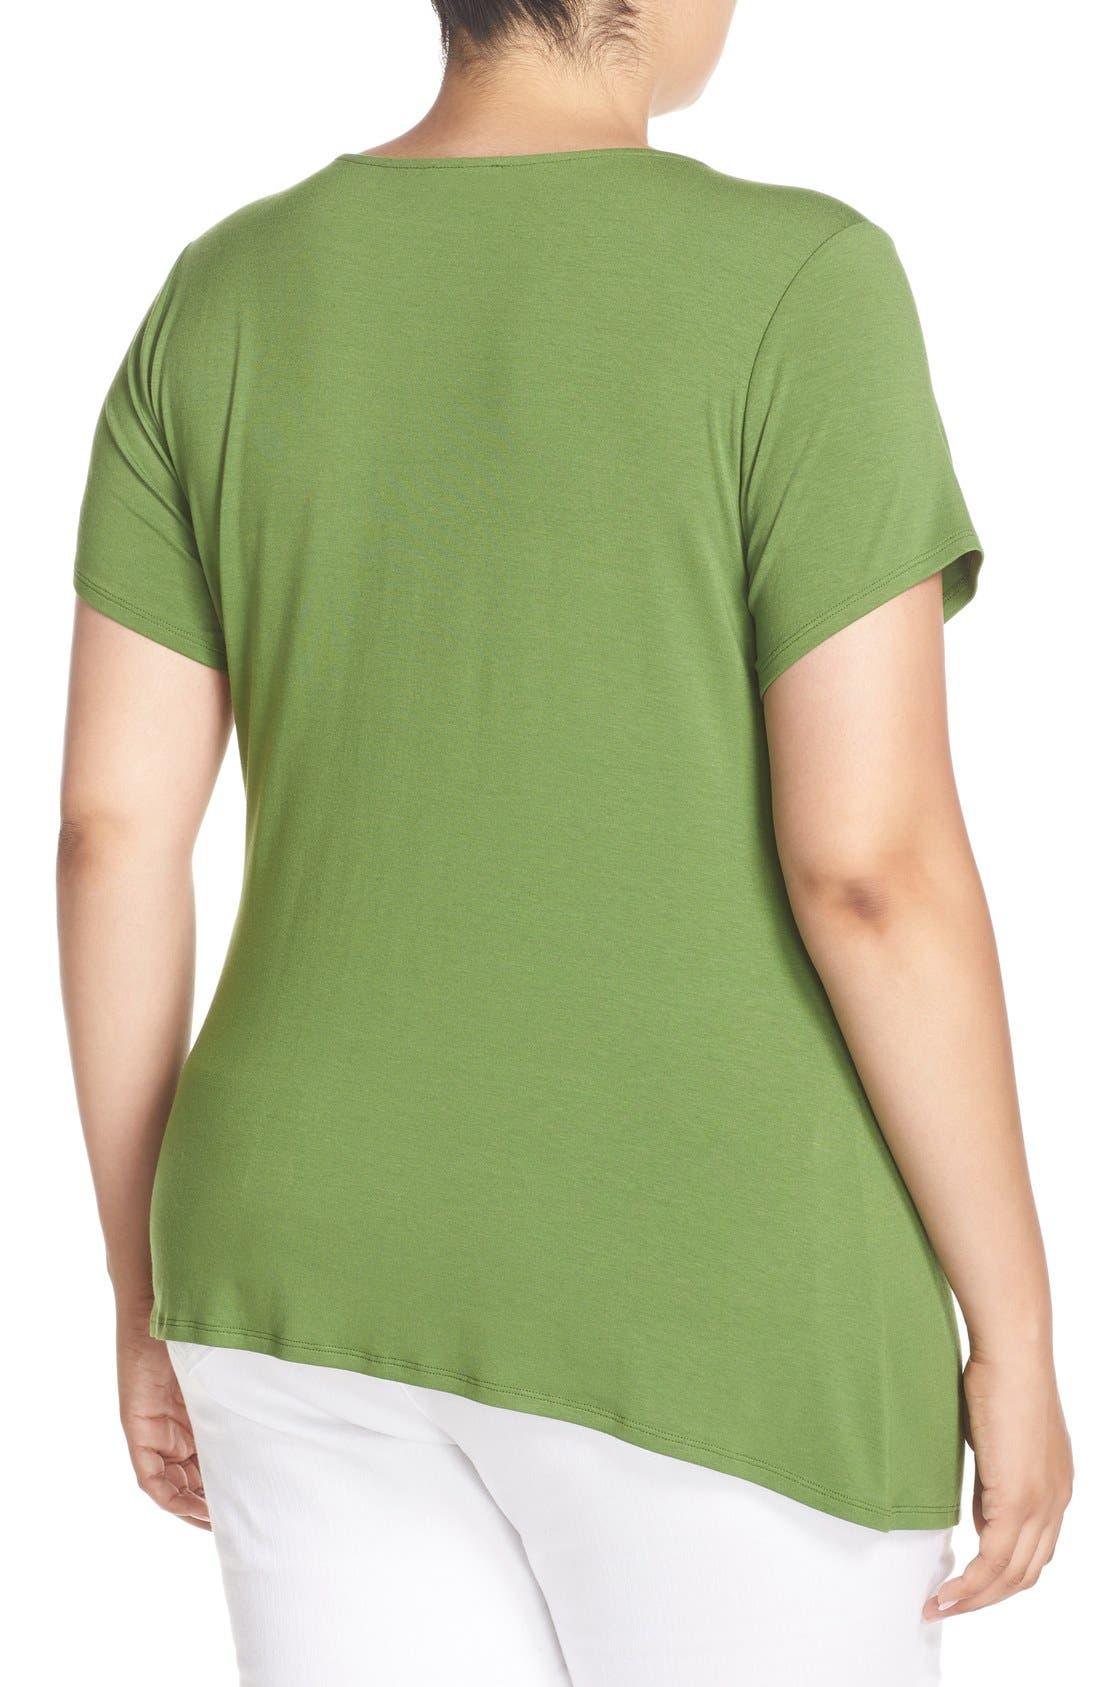 Alternate Image 2  - Vince Camuto Short Sleeve Side Pleat Asymmetrical Top (Plus Size)